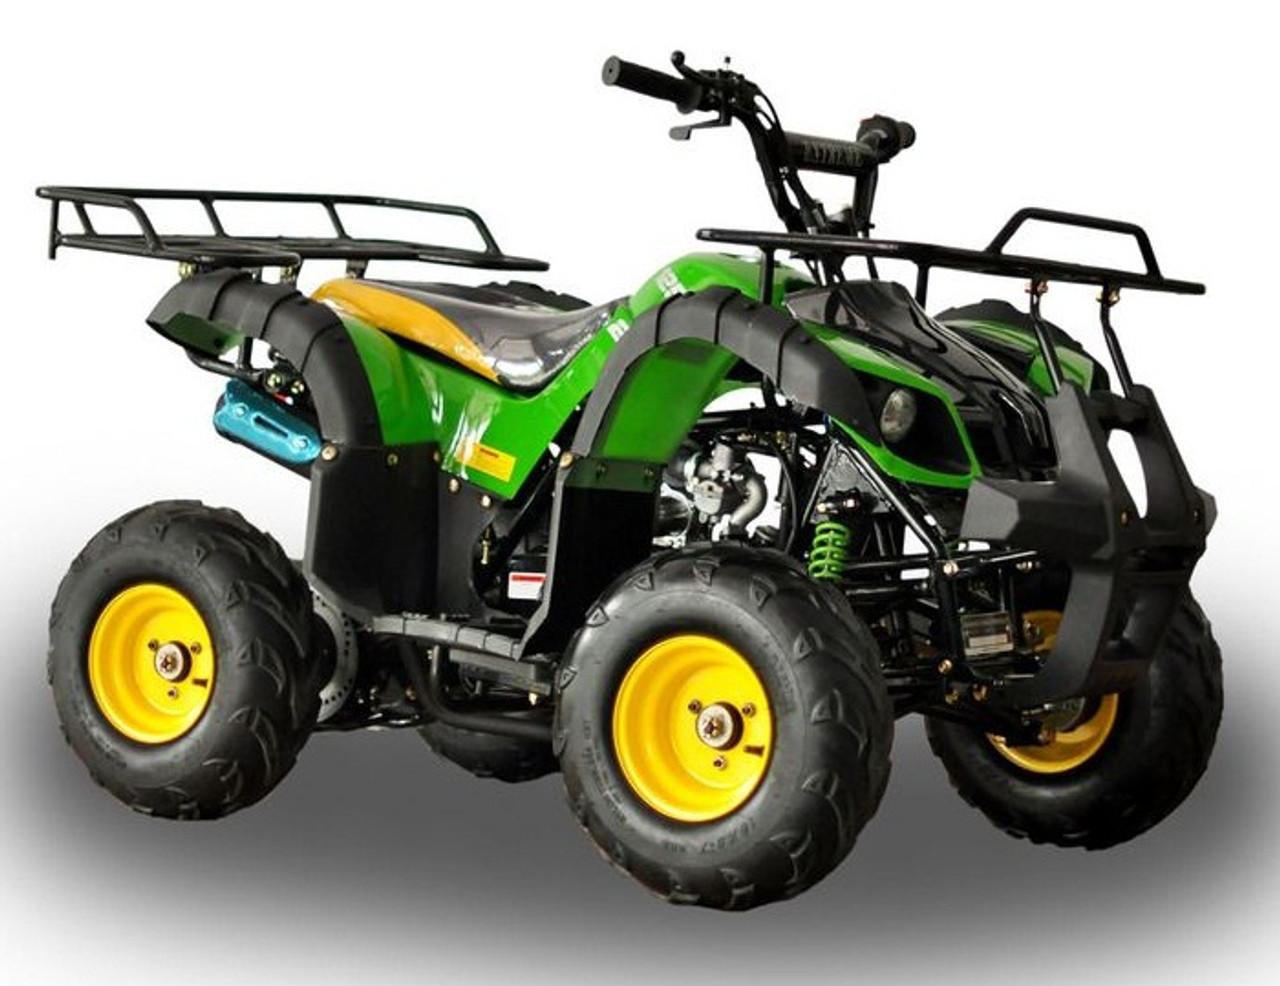 Vitacci RIDER-7 125cc ATV, Single Cylinder, 4 Stroke